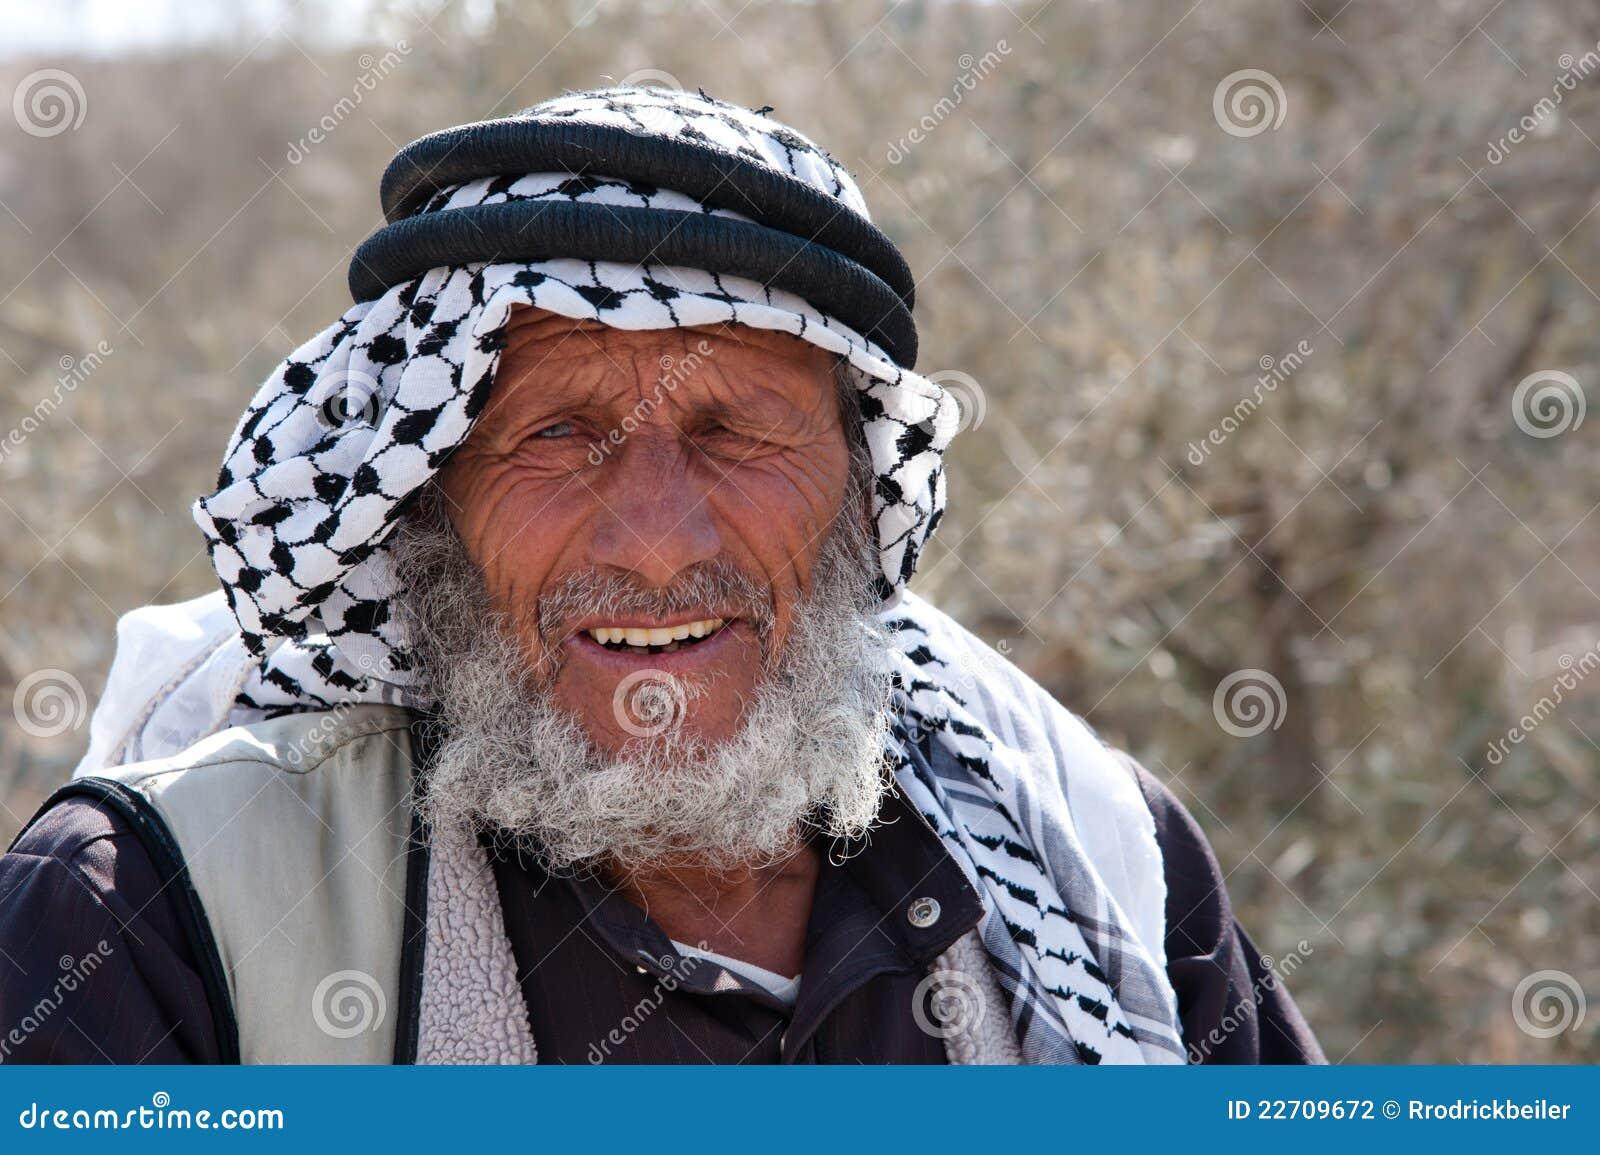 Palestinian Villager